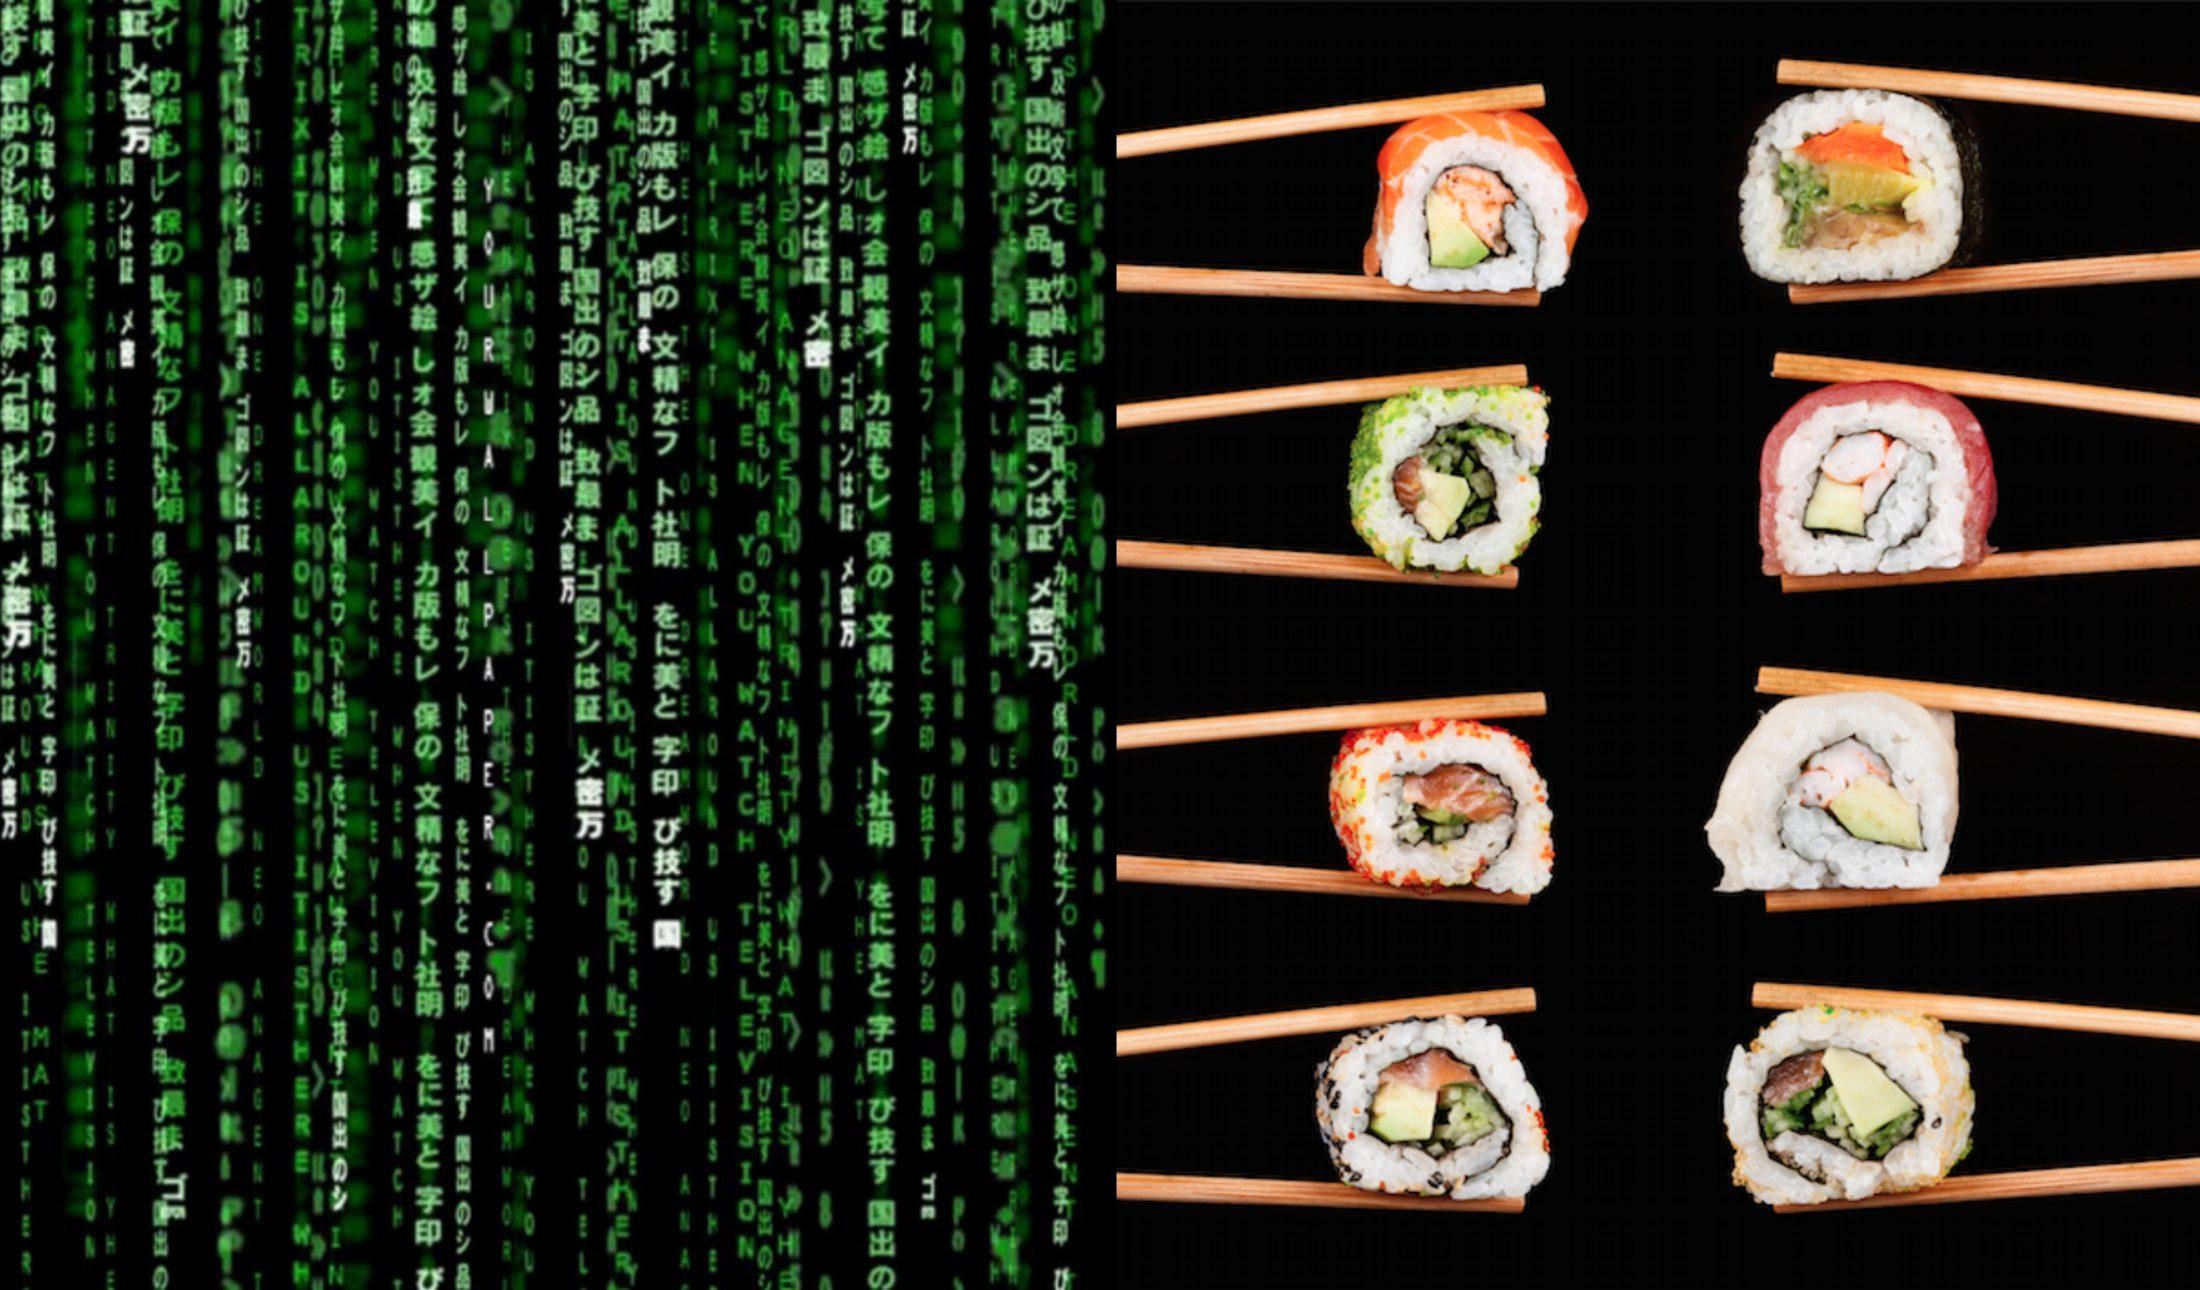 Sci-fi vs. sushi: A Mátrix című film legendás kódjainak titka - Dining Guide